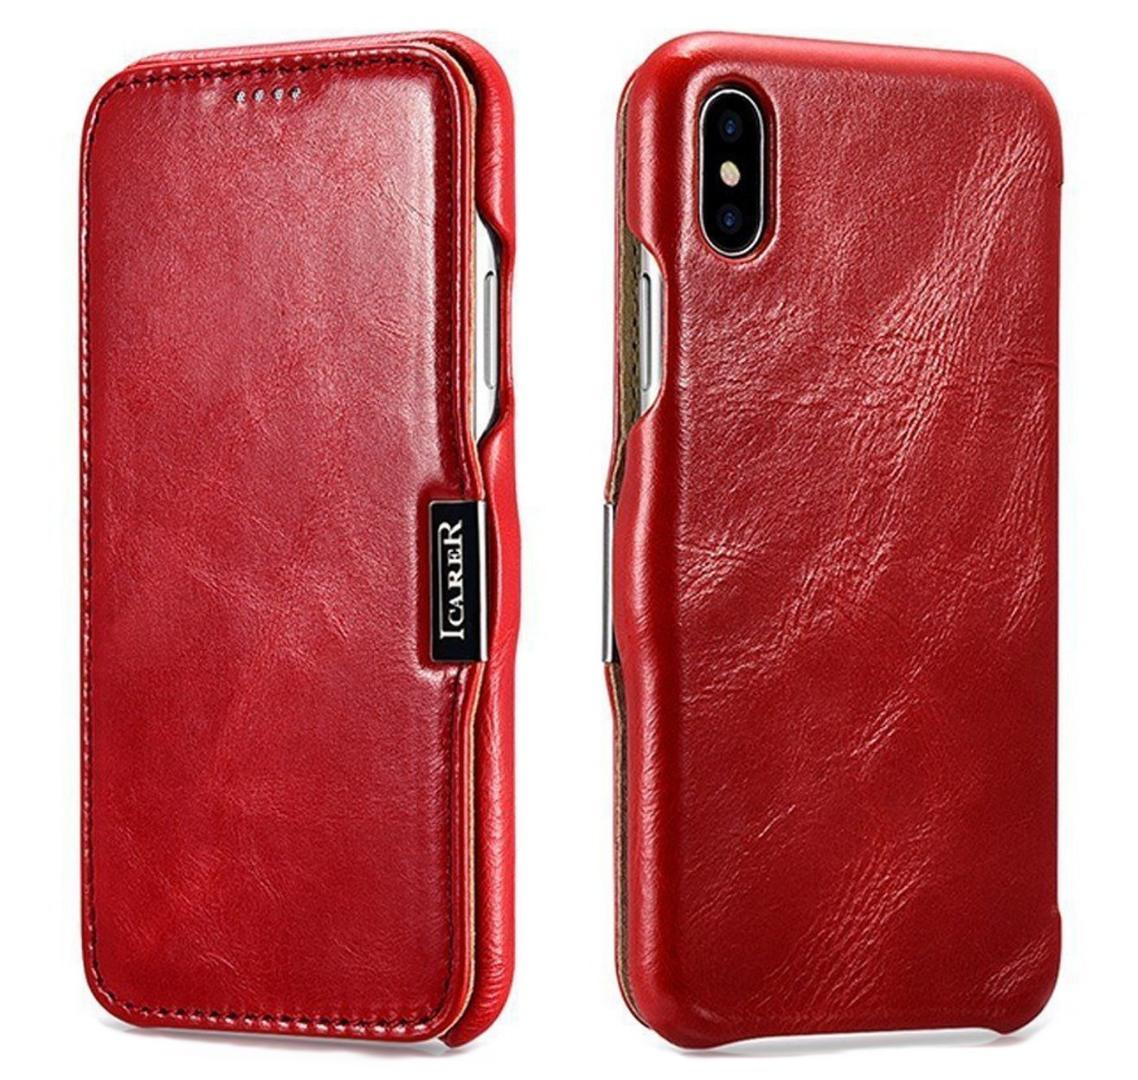 Husa din piele, tip carte, inchidere magnetica, iPhone X / XS - iCARER Vintage Side Open, Rosu burgund